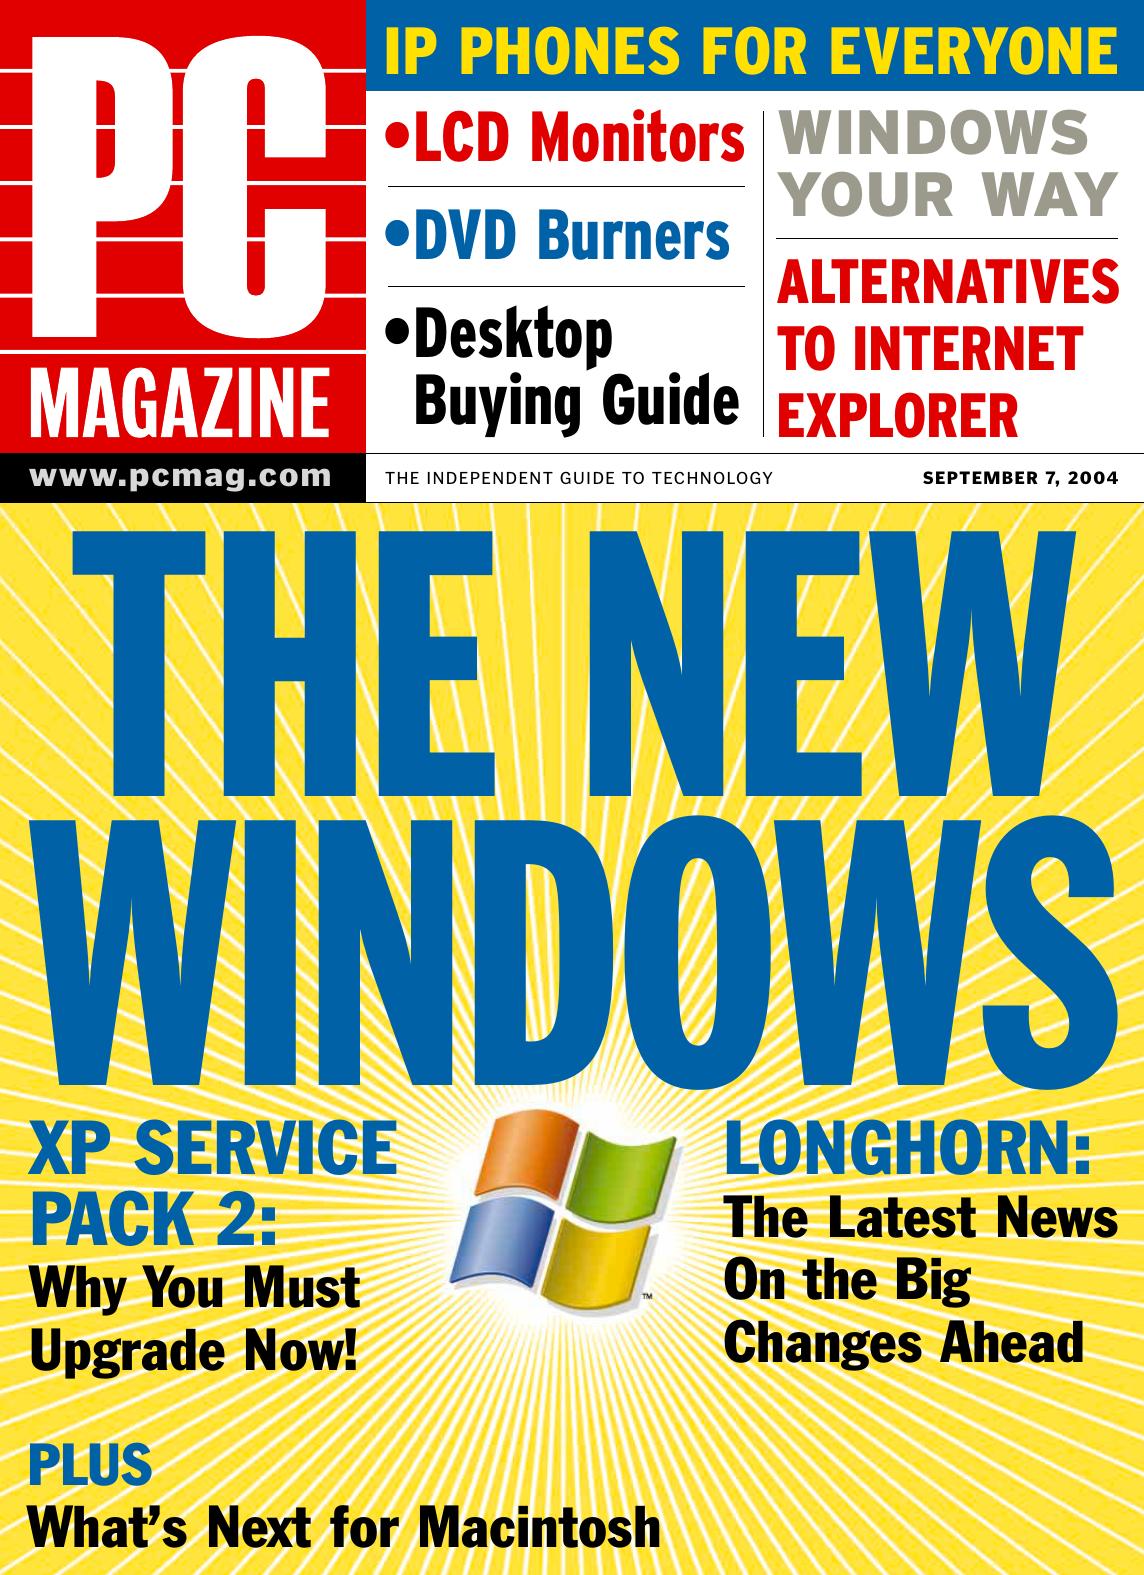 b144b26eb XP SERVICE PACK 2: LONGHORN: | manualzz.com